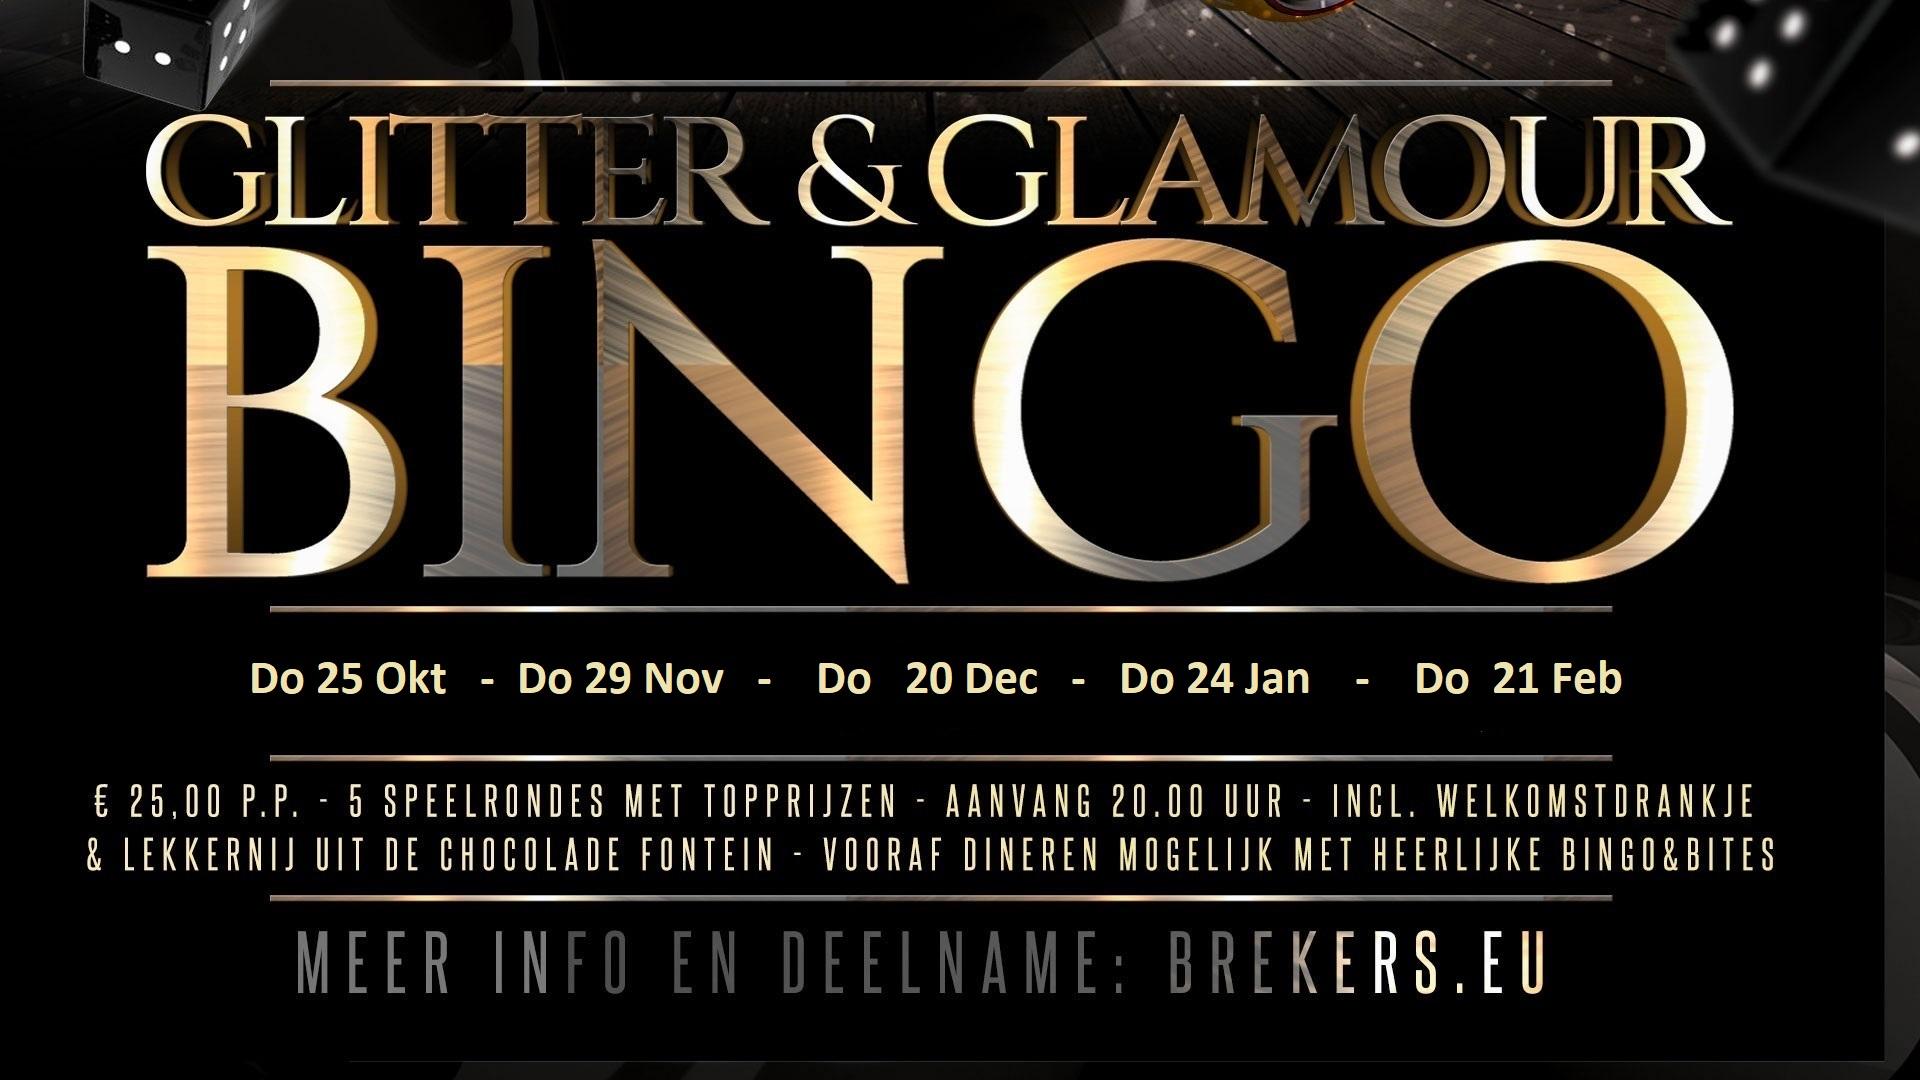 Glitter & Glamour Bingo 24 januari